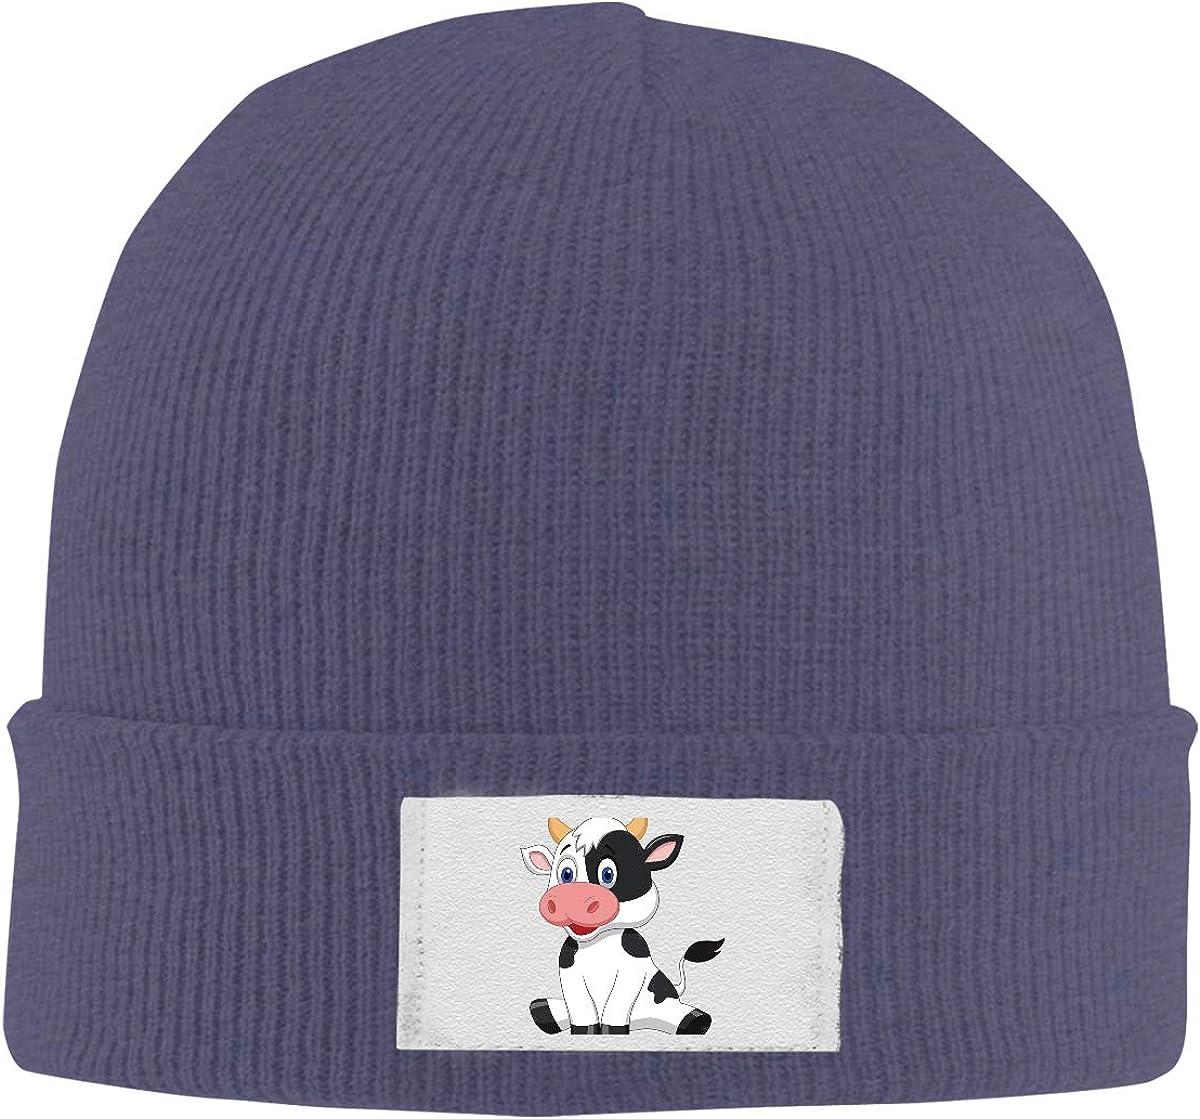 Stretchy Cuff Beanie Hat Black Dunpaiaa Skull Caps Cute Cartoon Cow Winter Warm Knit Hats